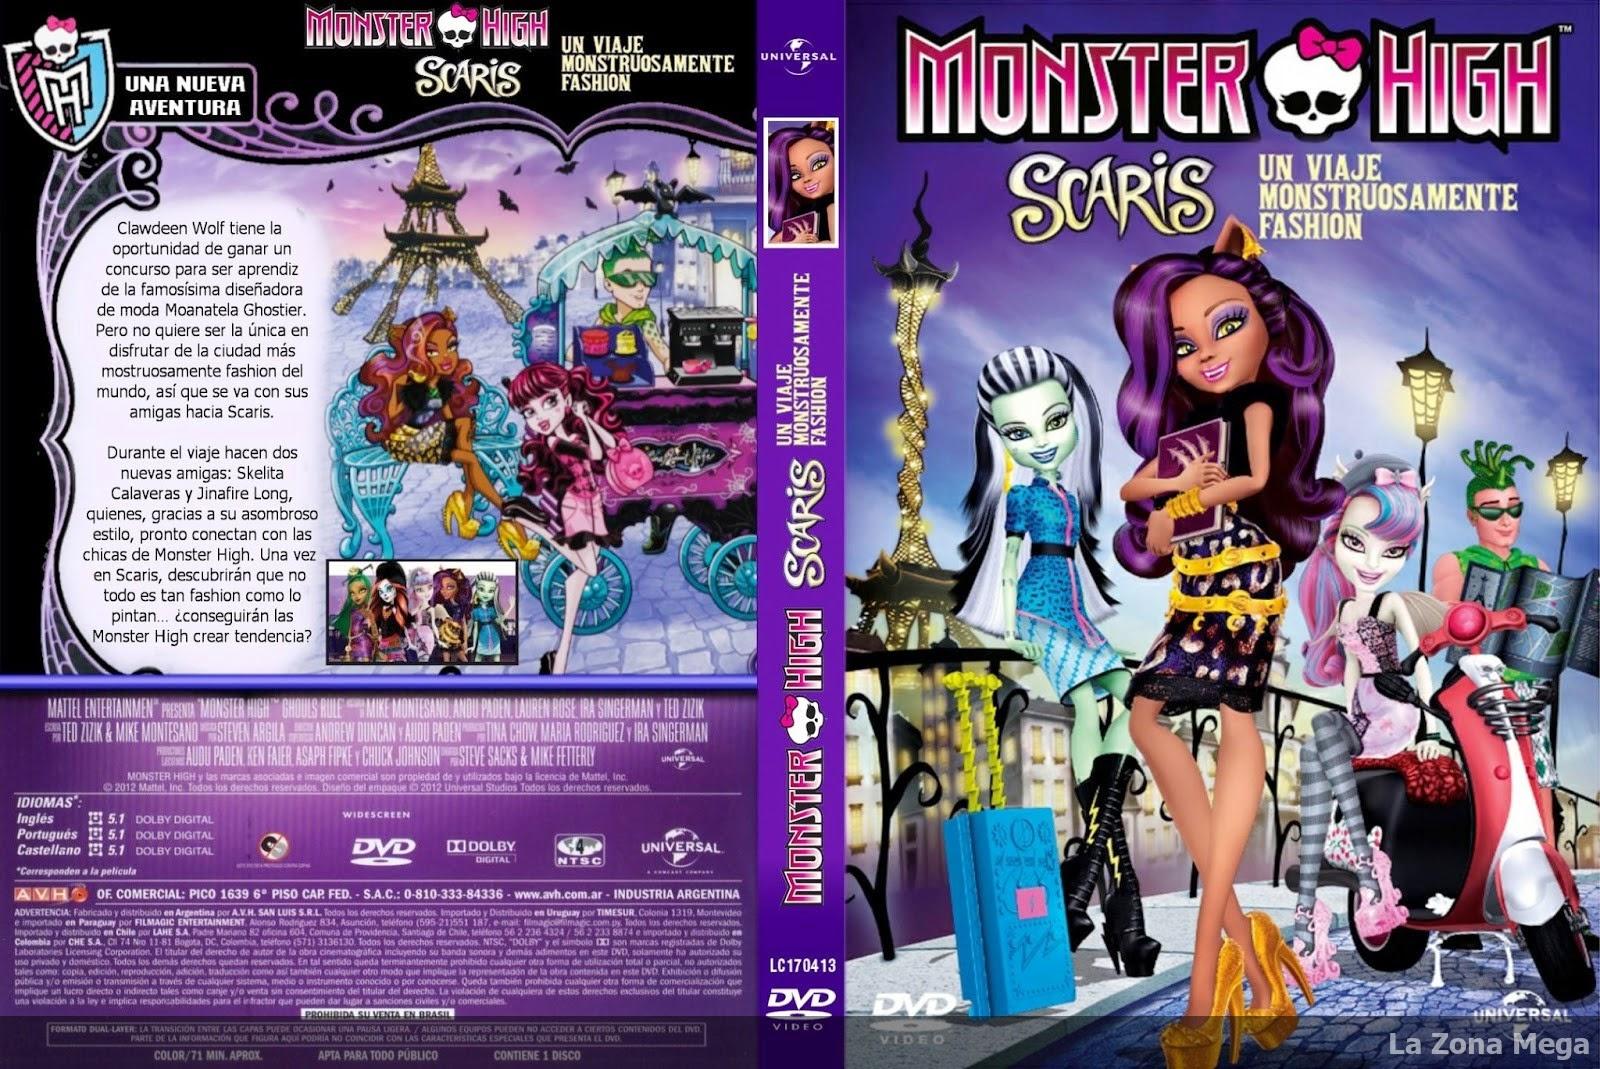 Monster High Un Viaje Monstruosamente Fashion Dvdrip